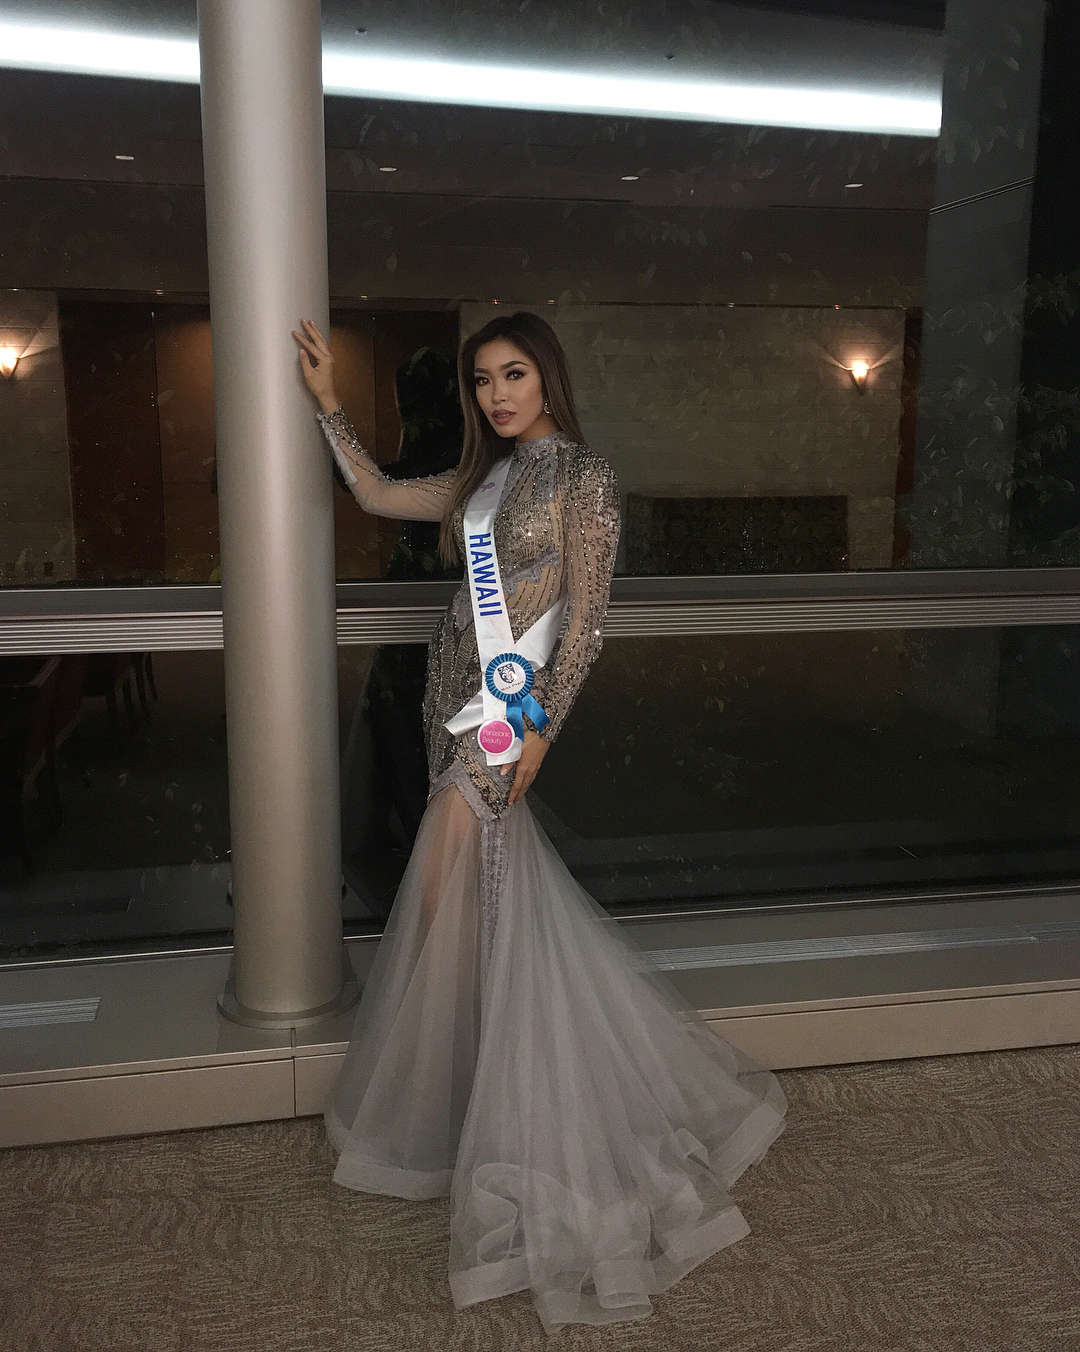 courtney coleman, miss international hawaii 2017. 22794312